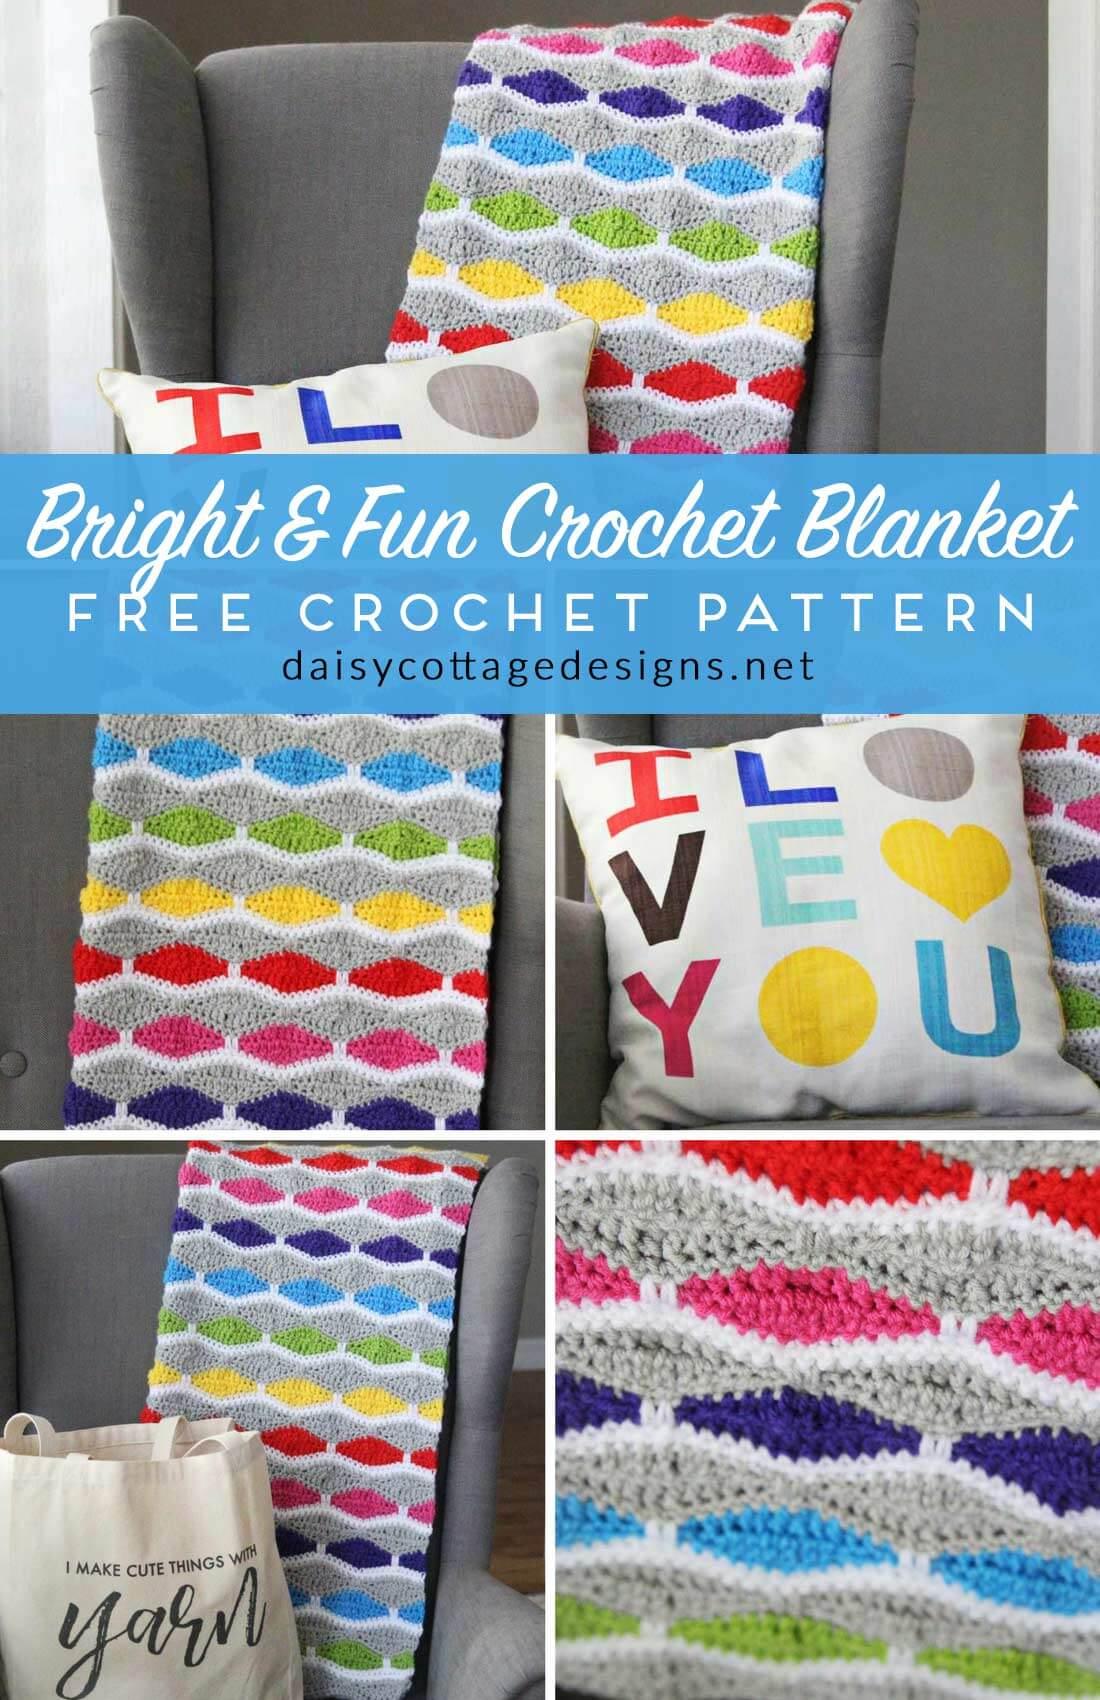 Bright & Fun Free Blanket Crochet Pattern